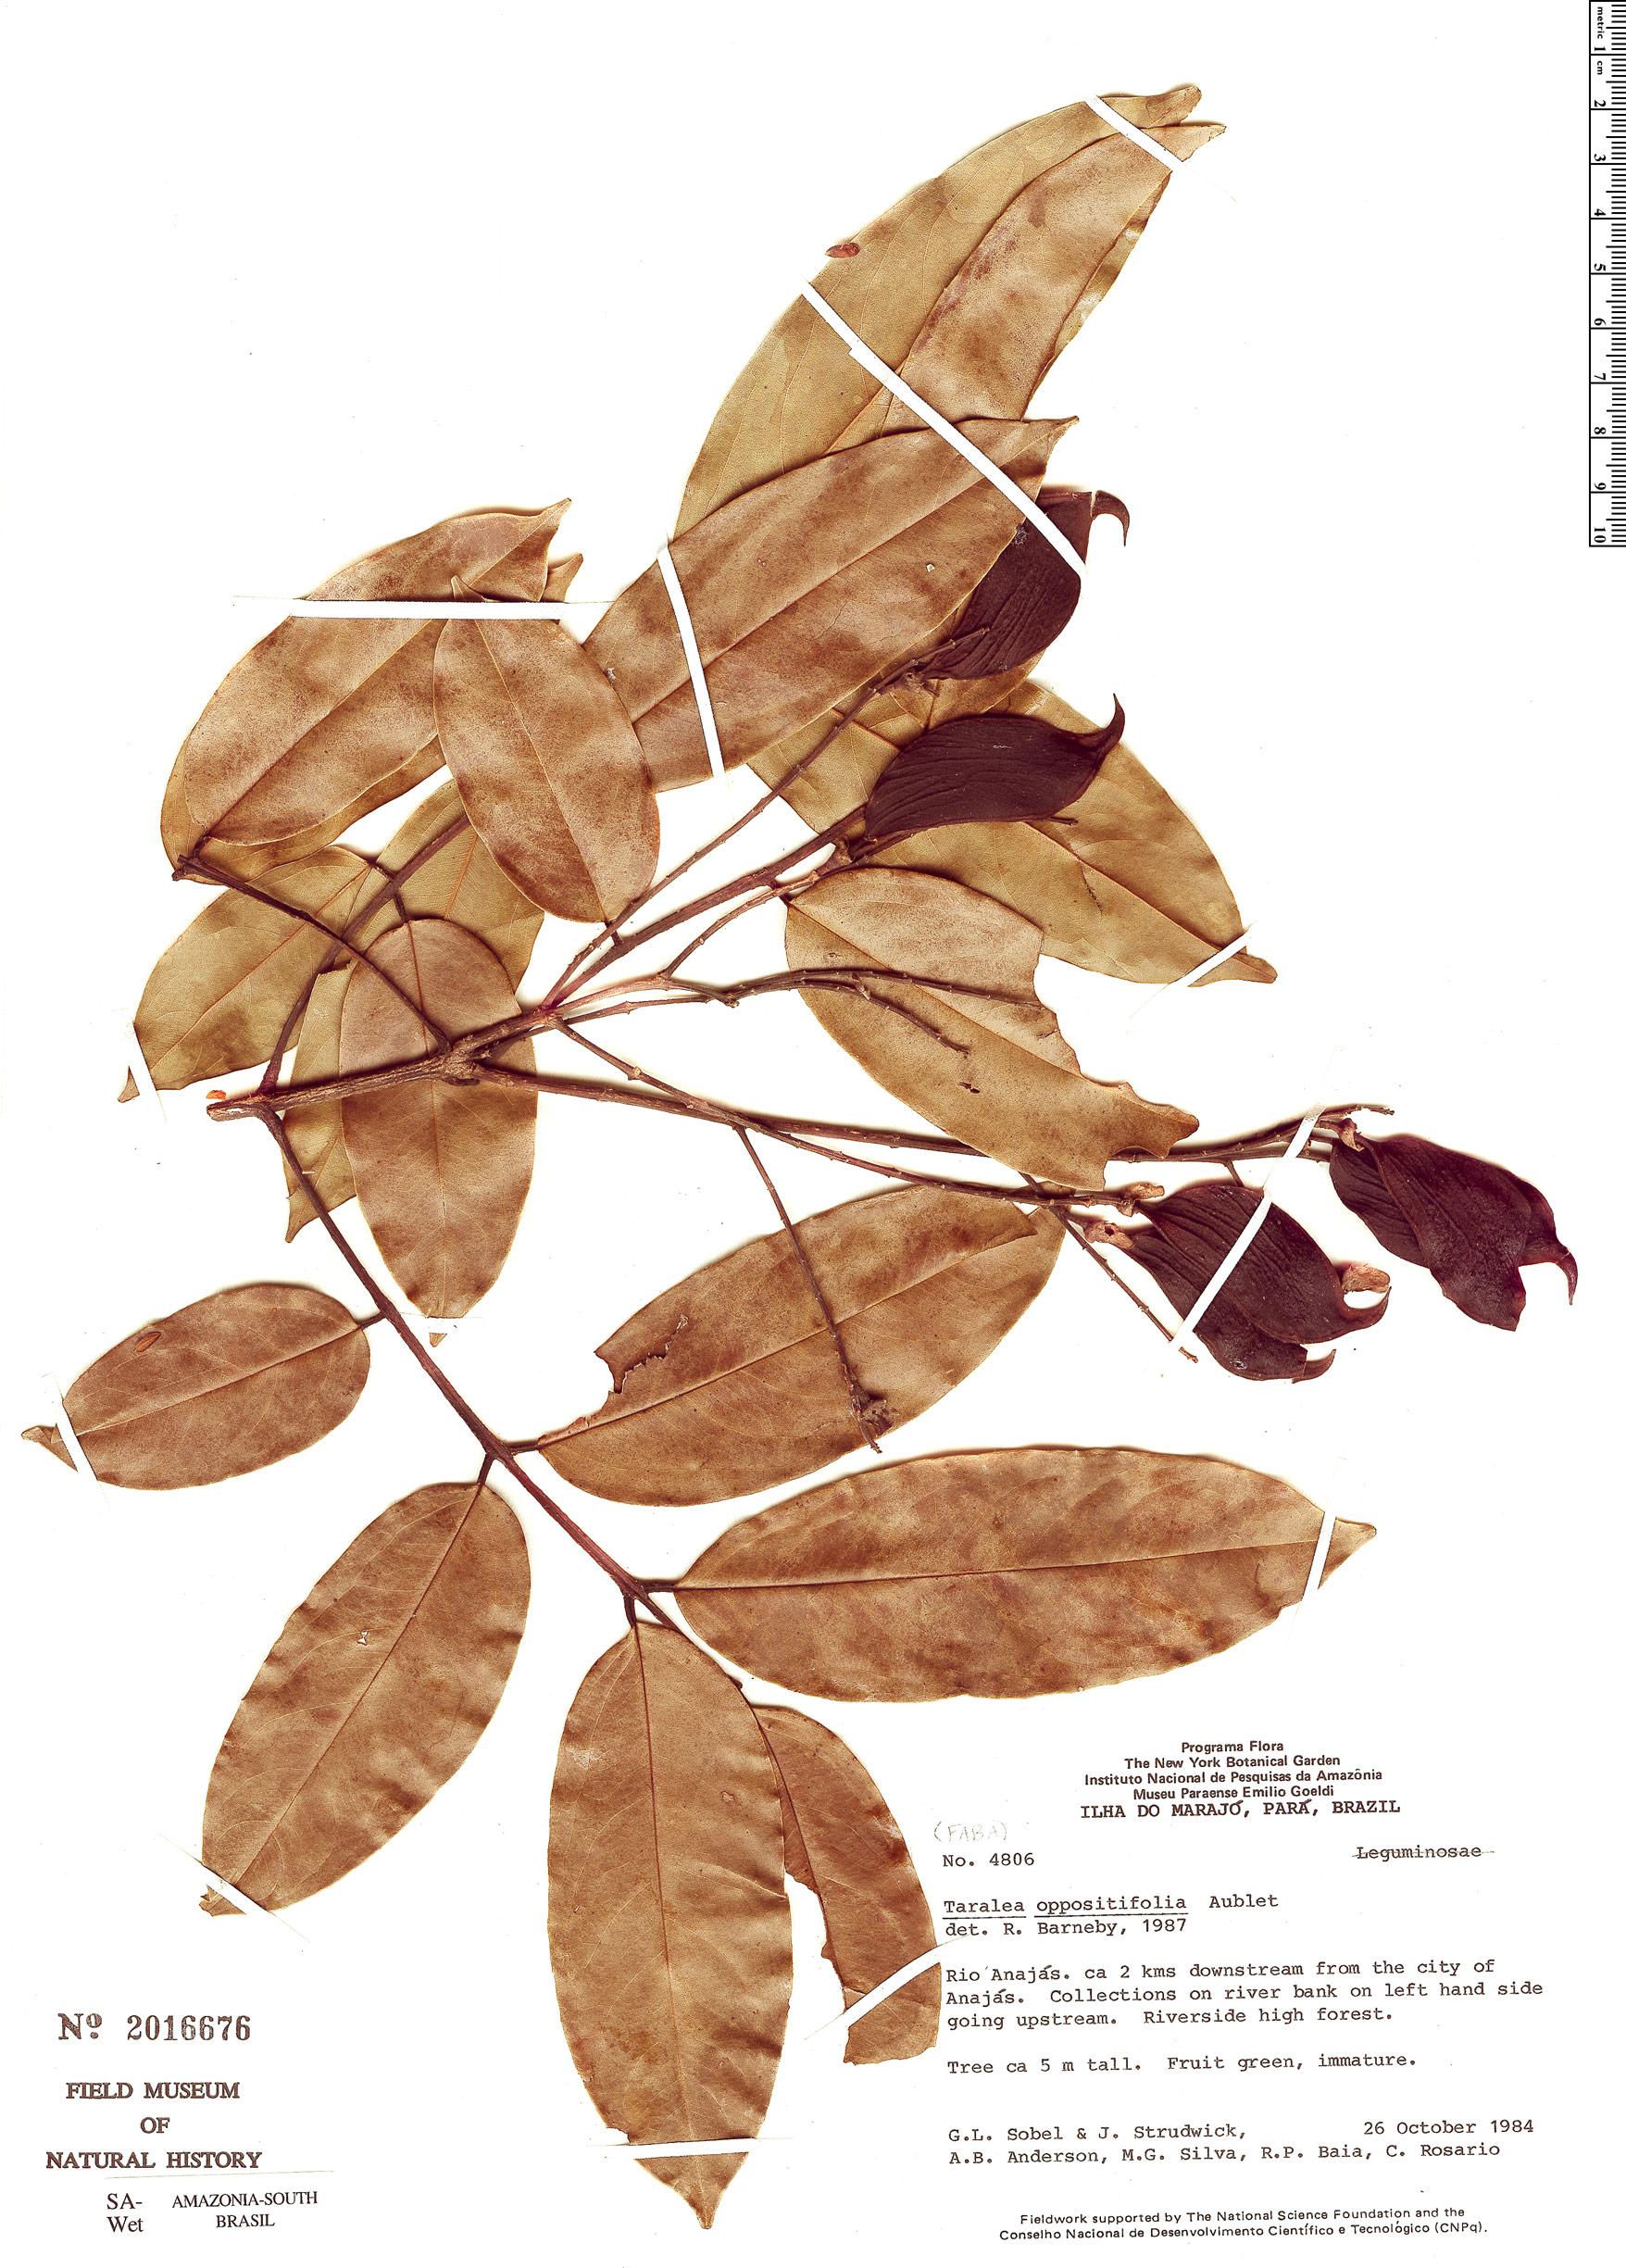 Specimen: Taralea oppositifolia